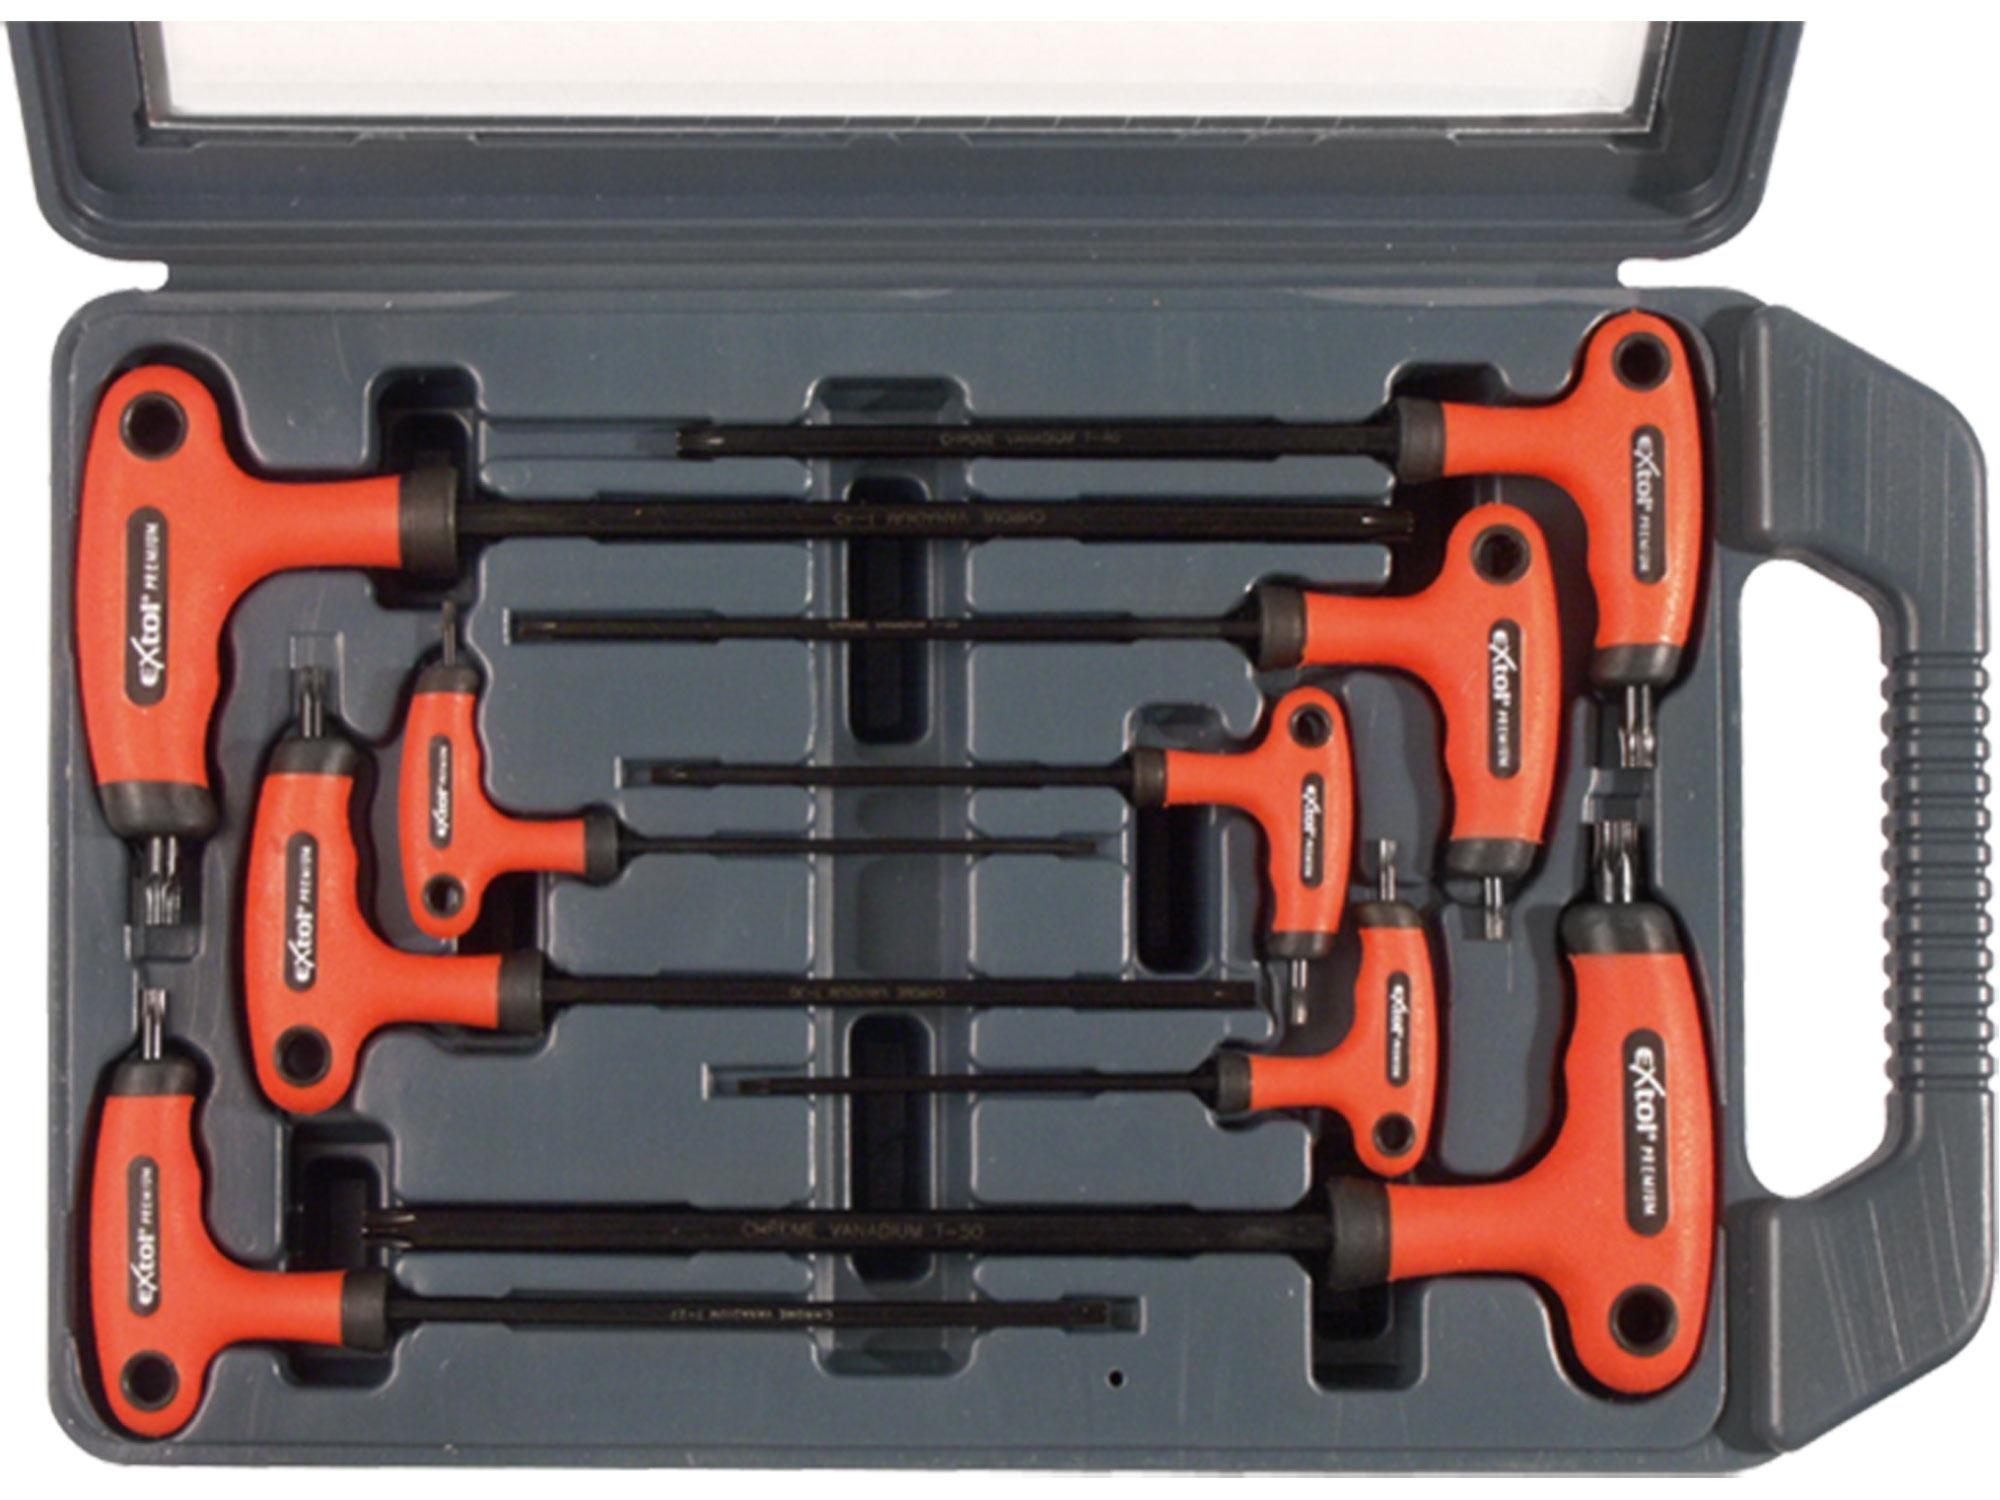 T-klíče TORX, sada 9ks, T10-50mm, EXTOL PREMIUM 8819401